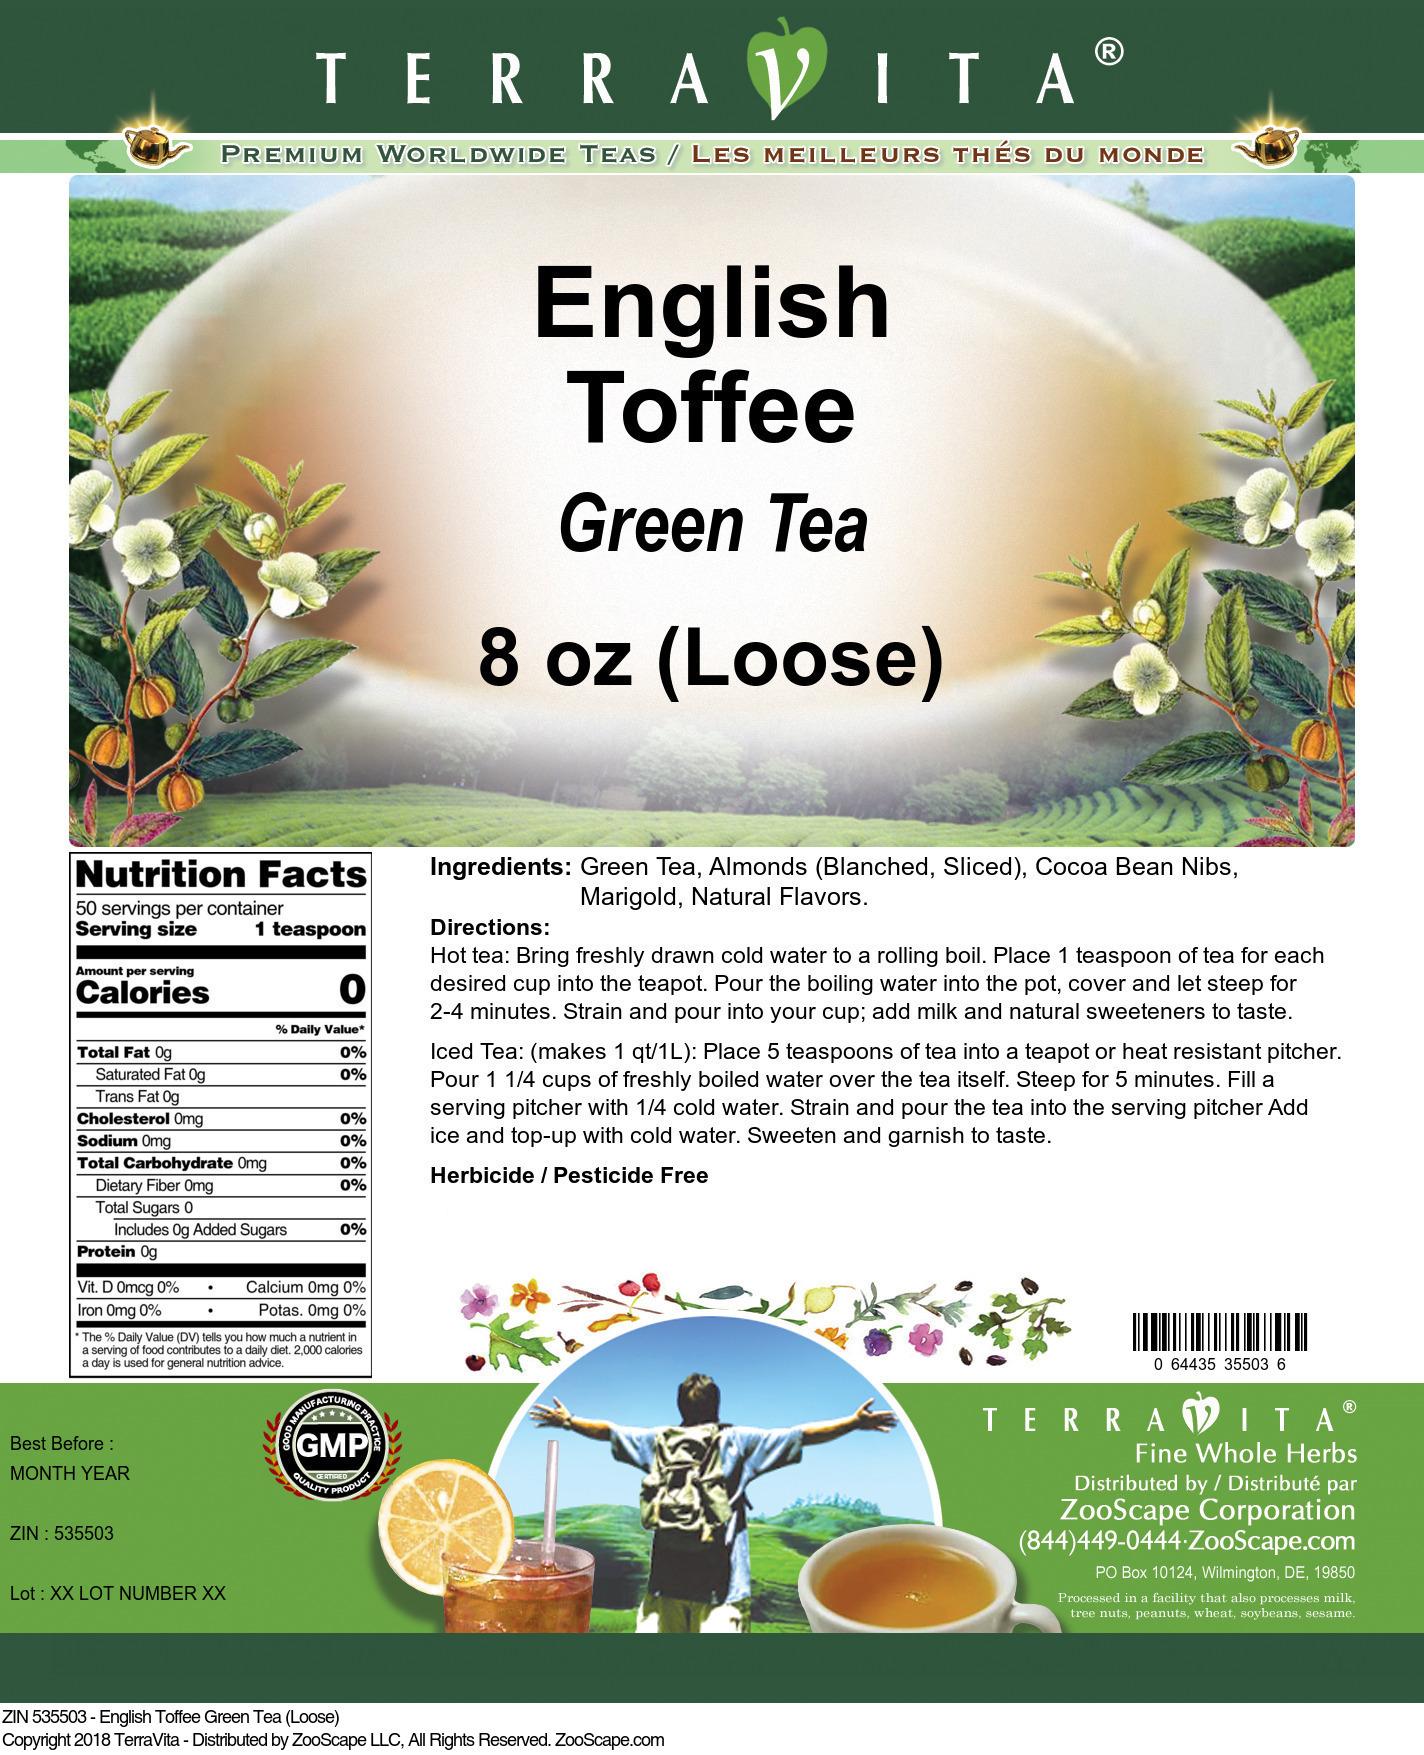 English Toffee Green Tea